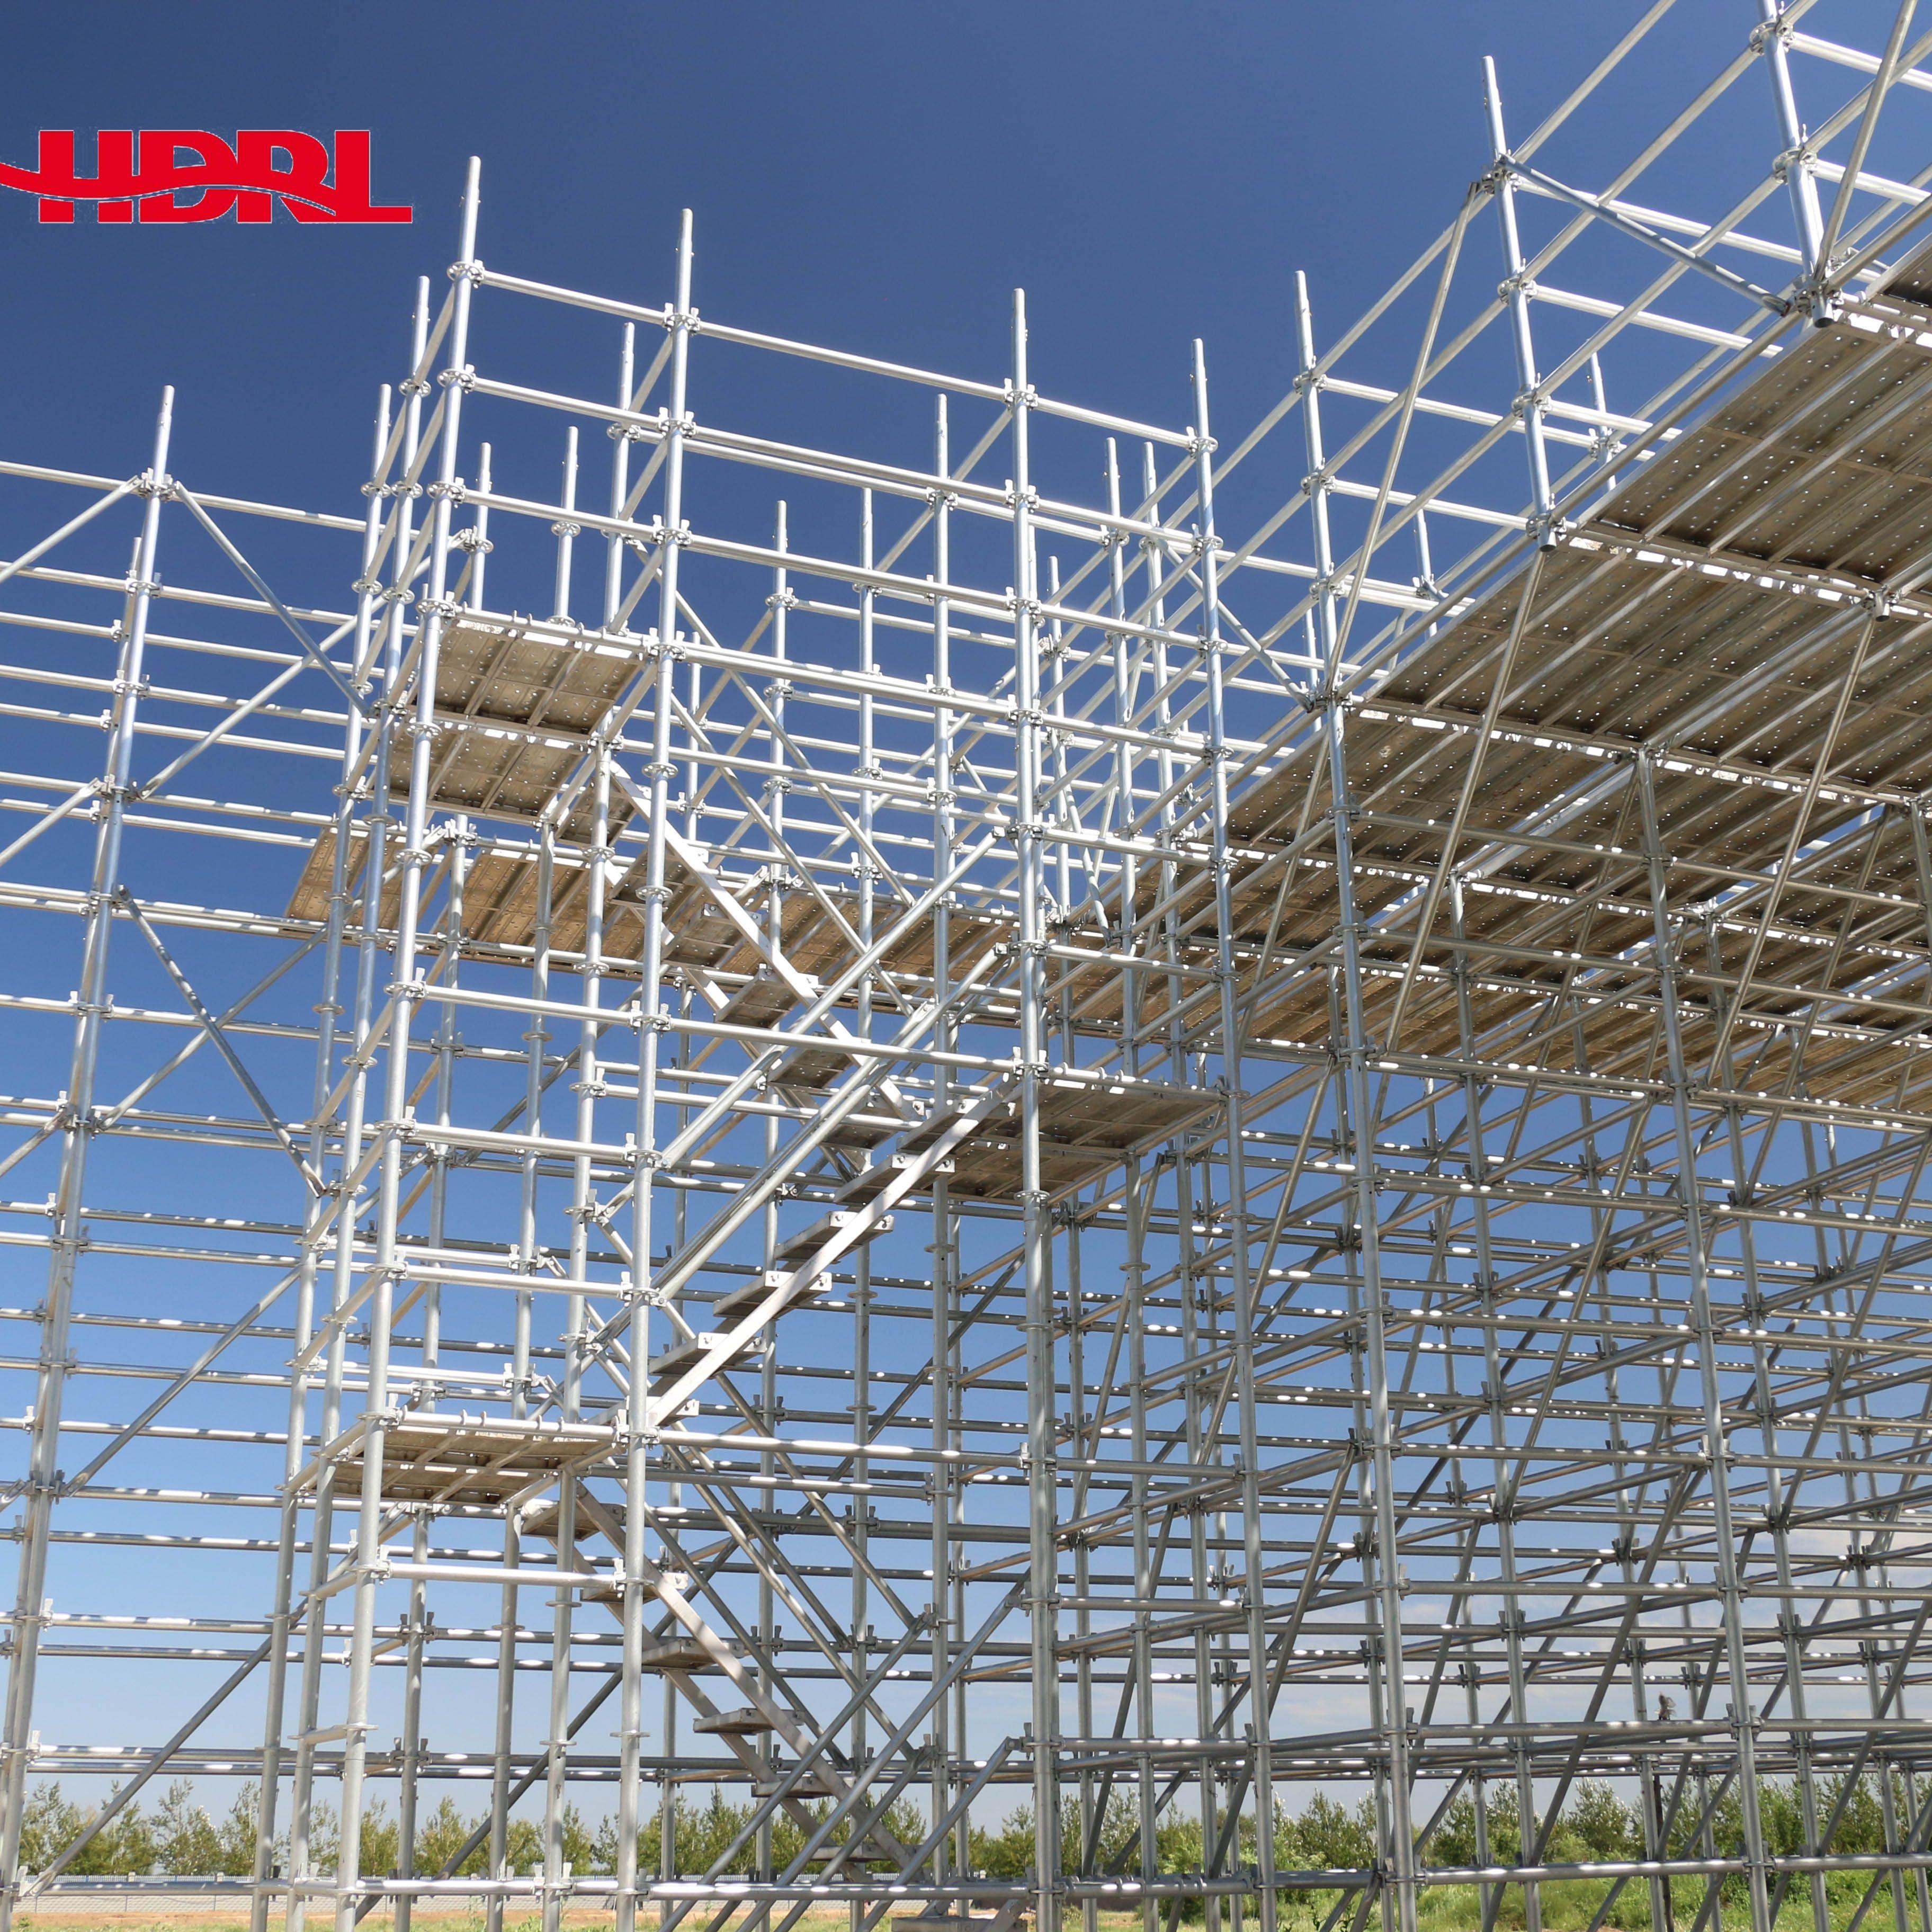 Heavy Duty Layher Allround Steel Ringlcok Scaffolding for Building/Bridge/Tunnel Construction